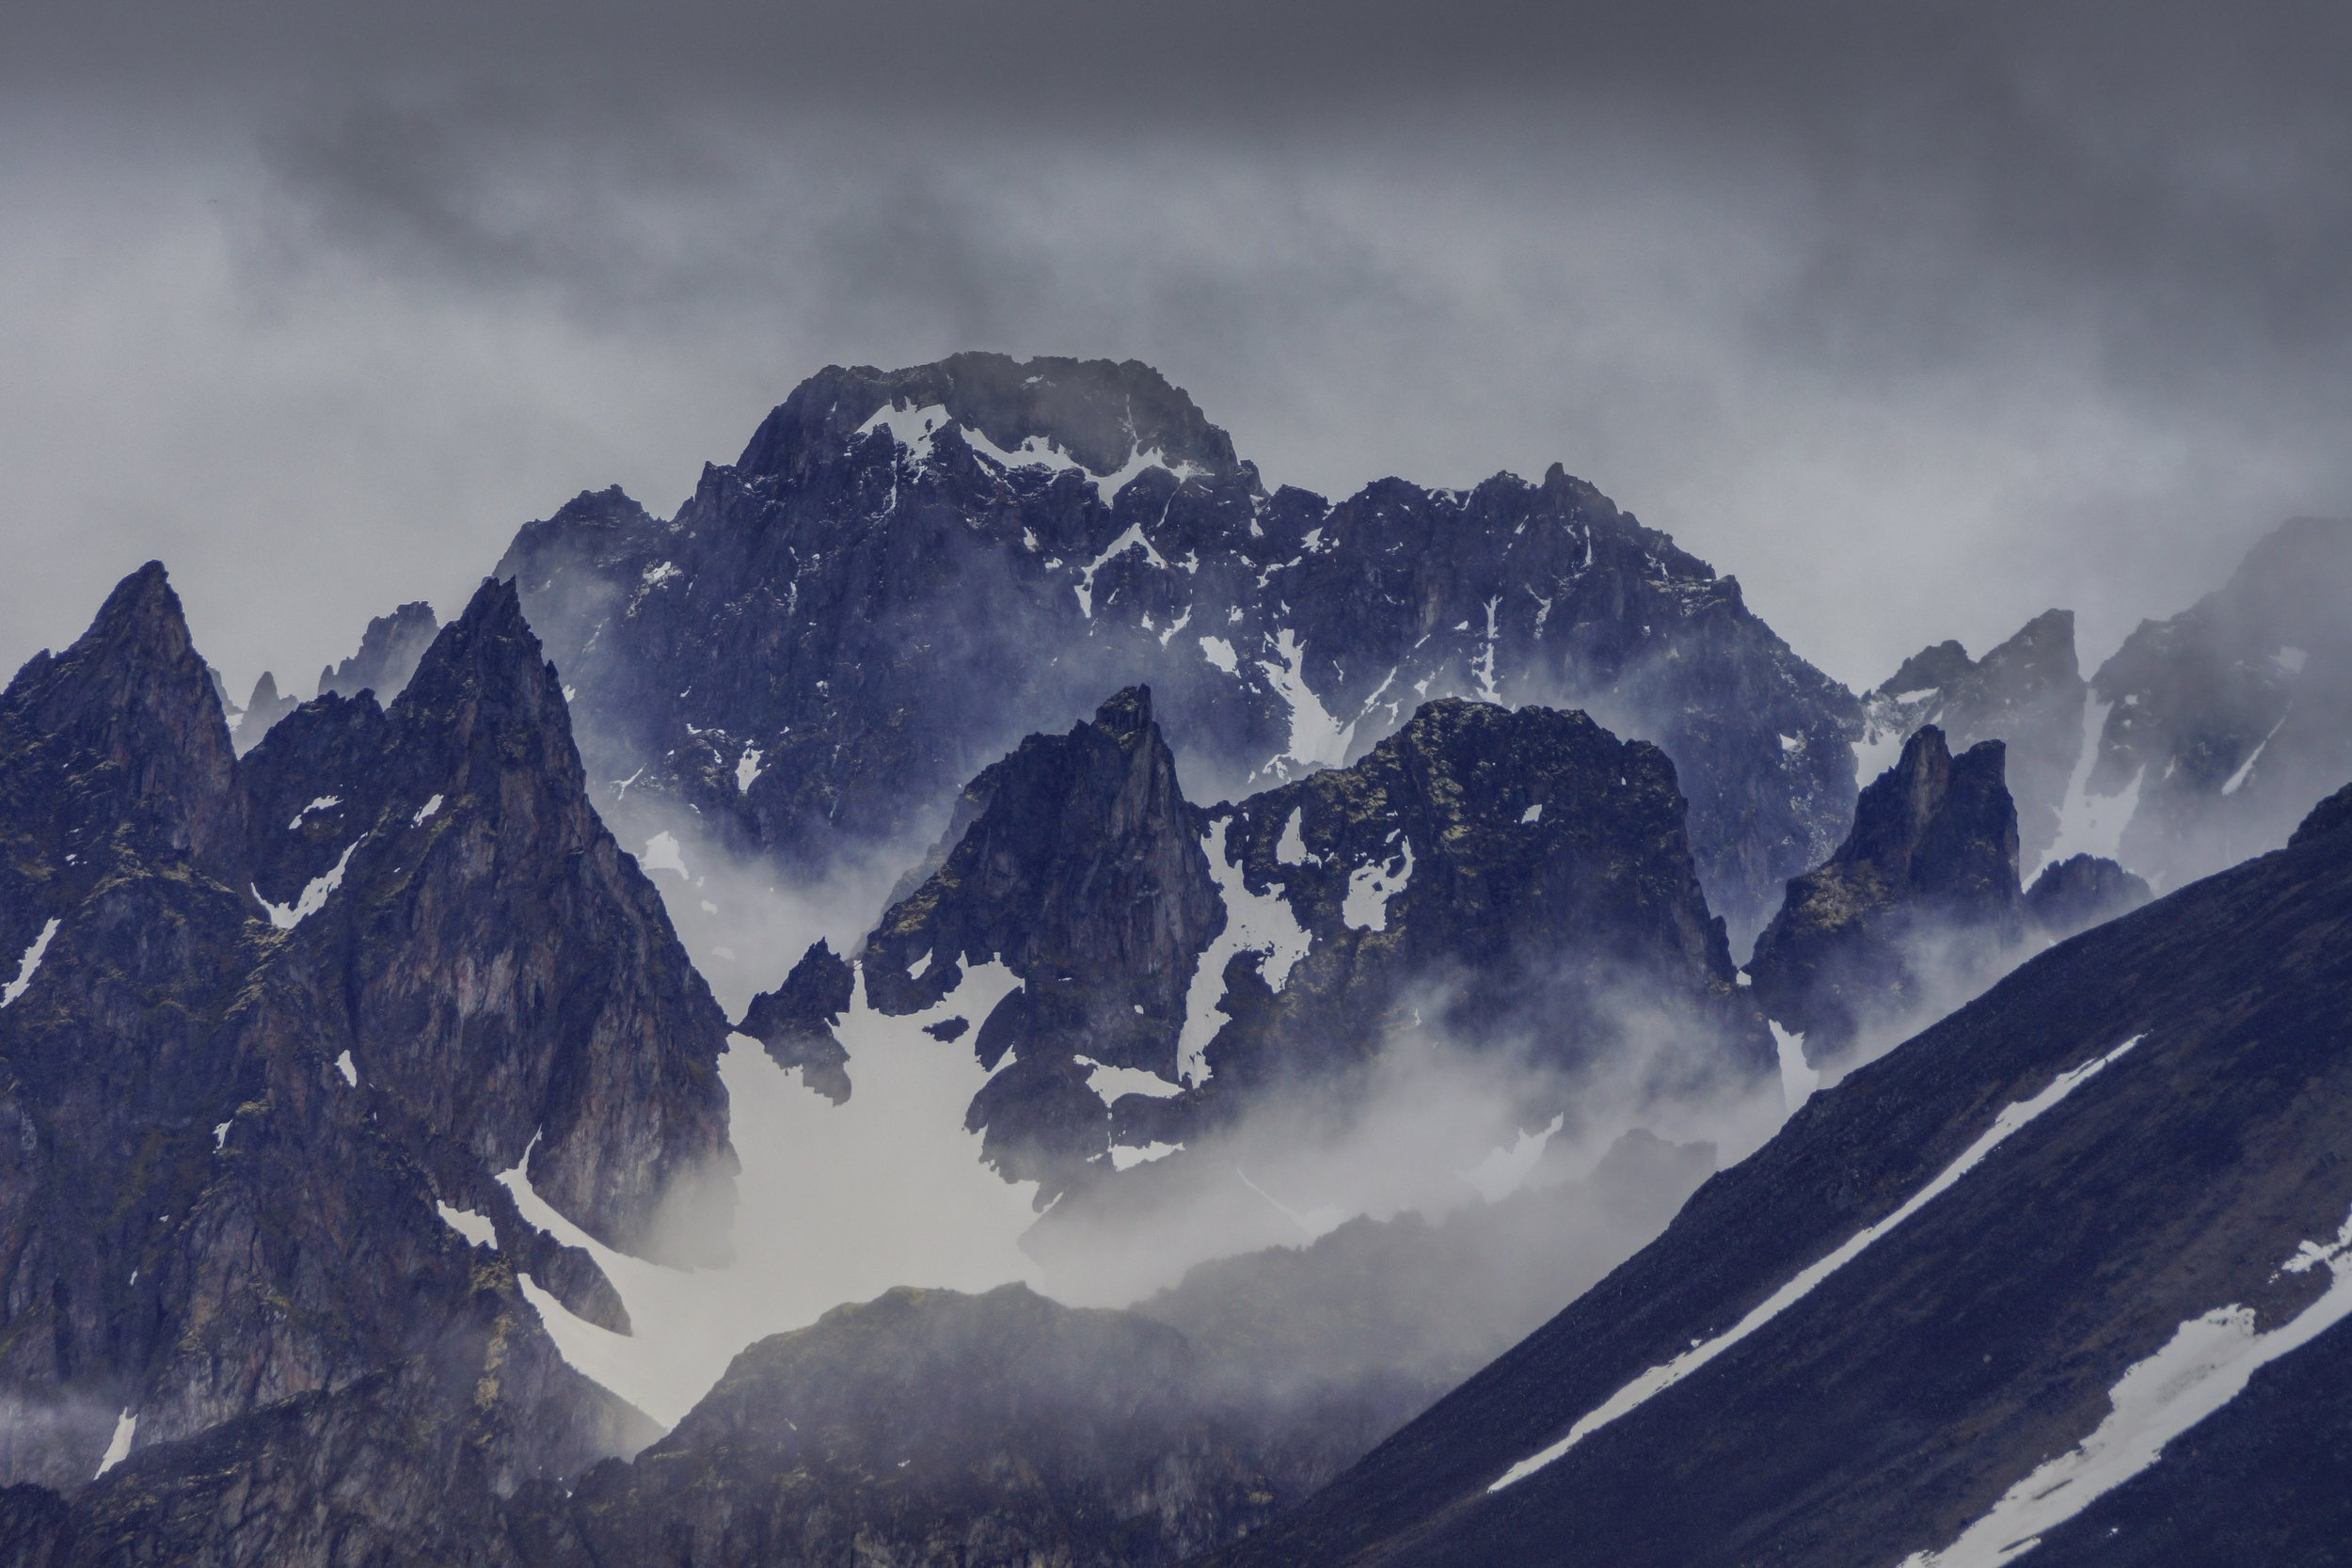 Spitzbergen - Pointed Mountains